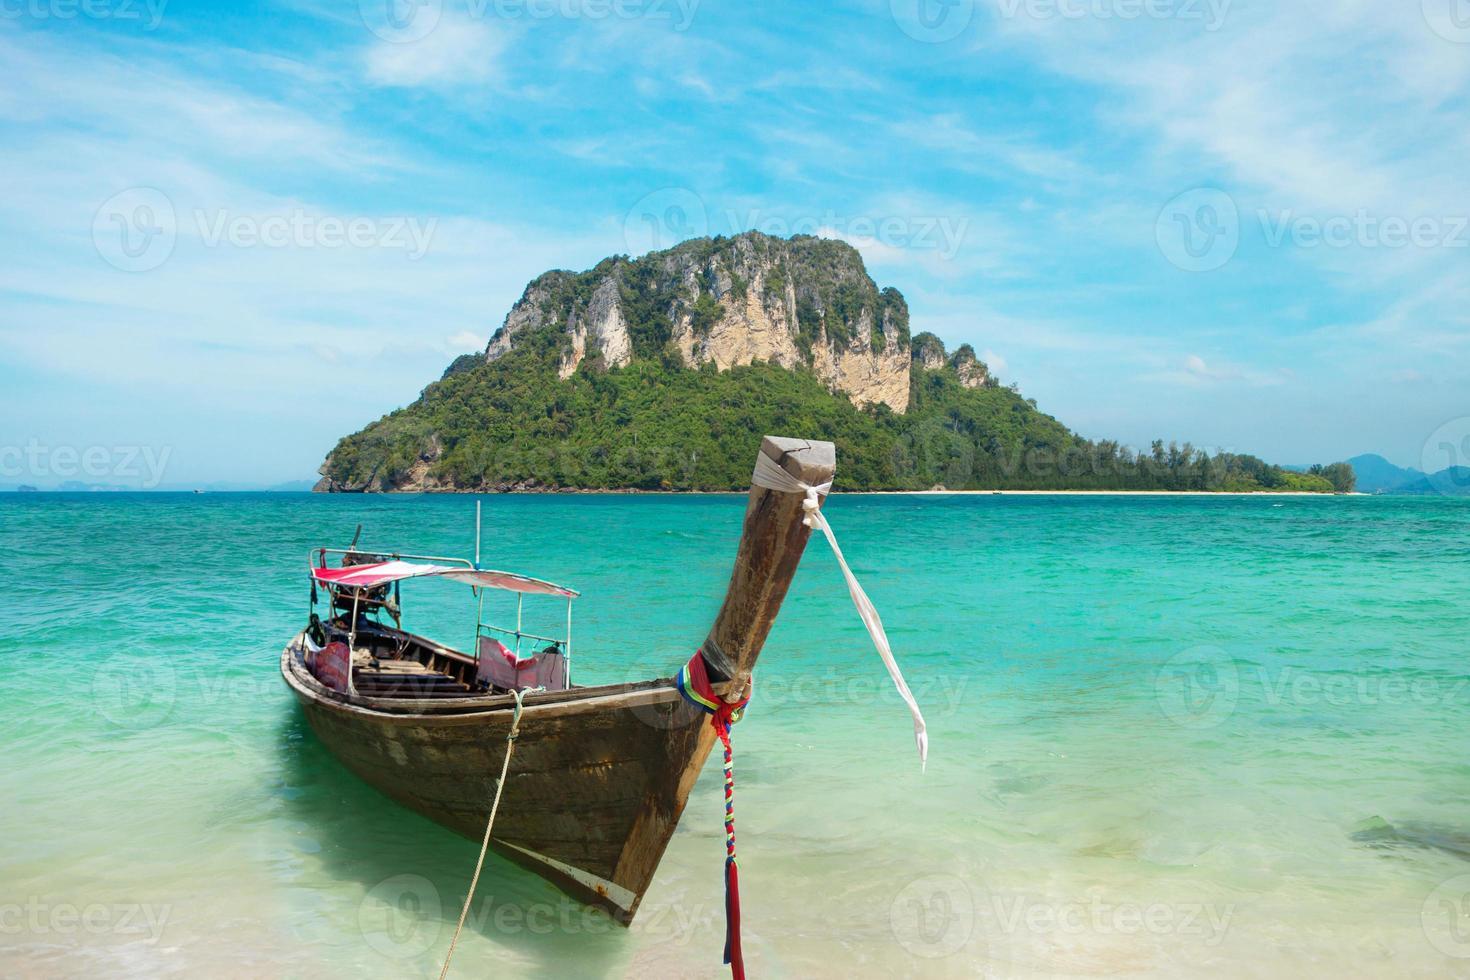 Andaman island and fisherman boat photo